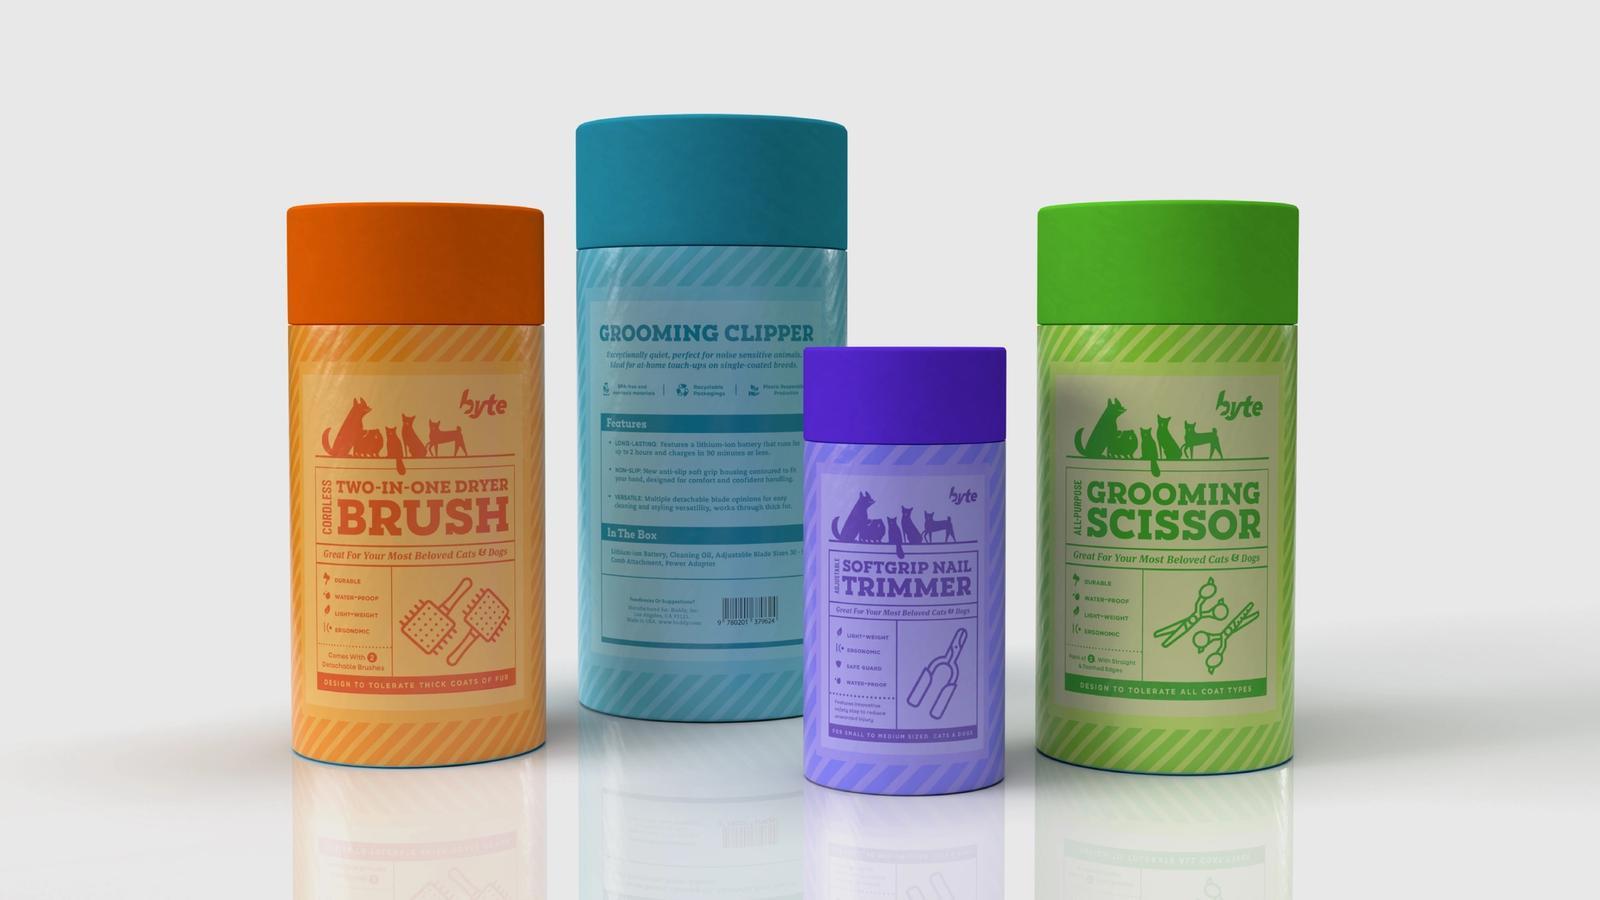 Byte Pet Grooming // Product Packaging